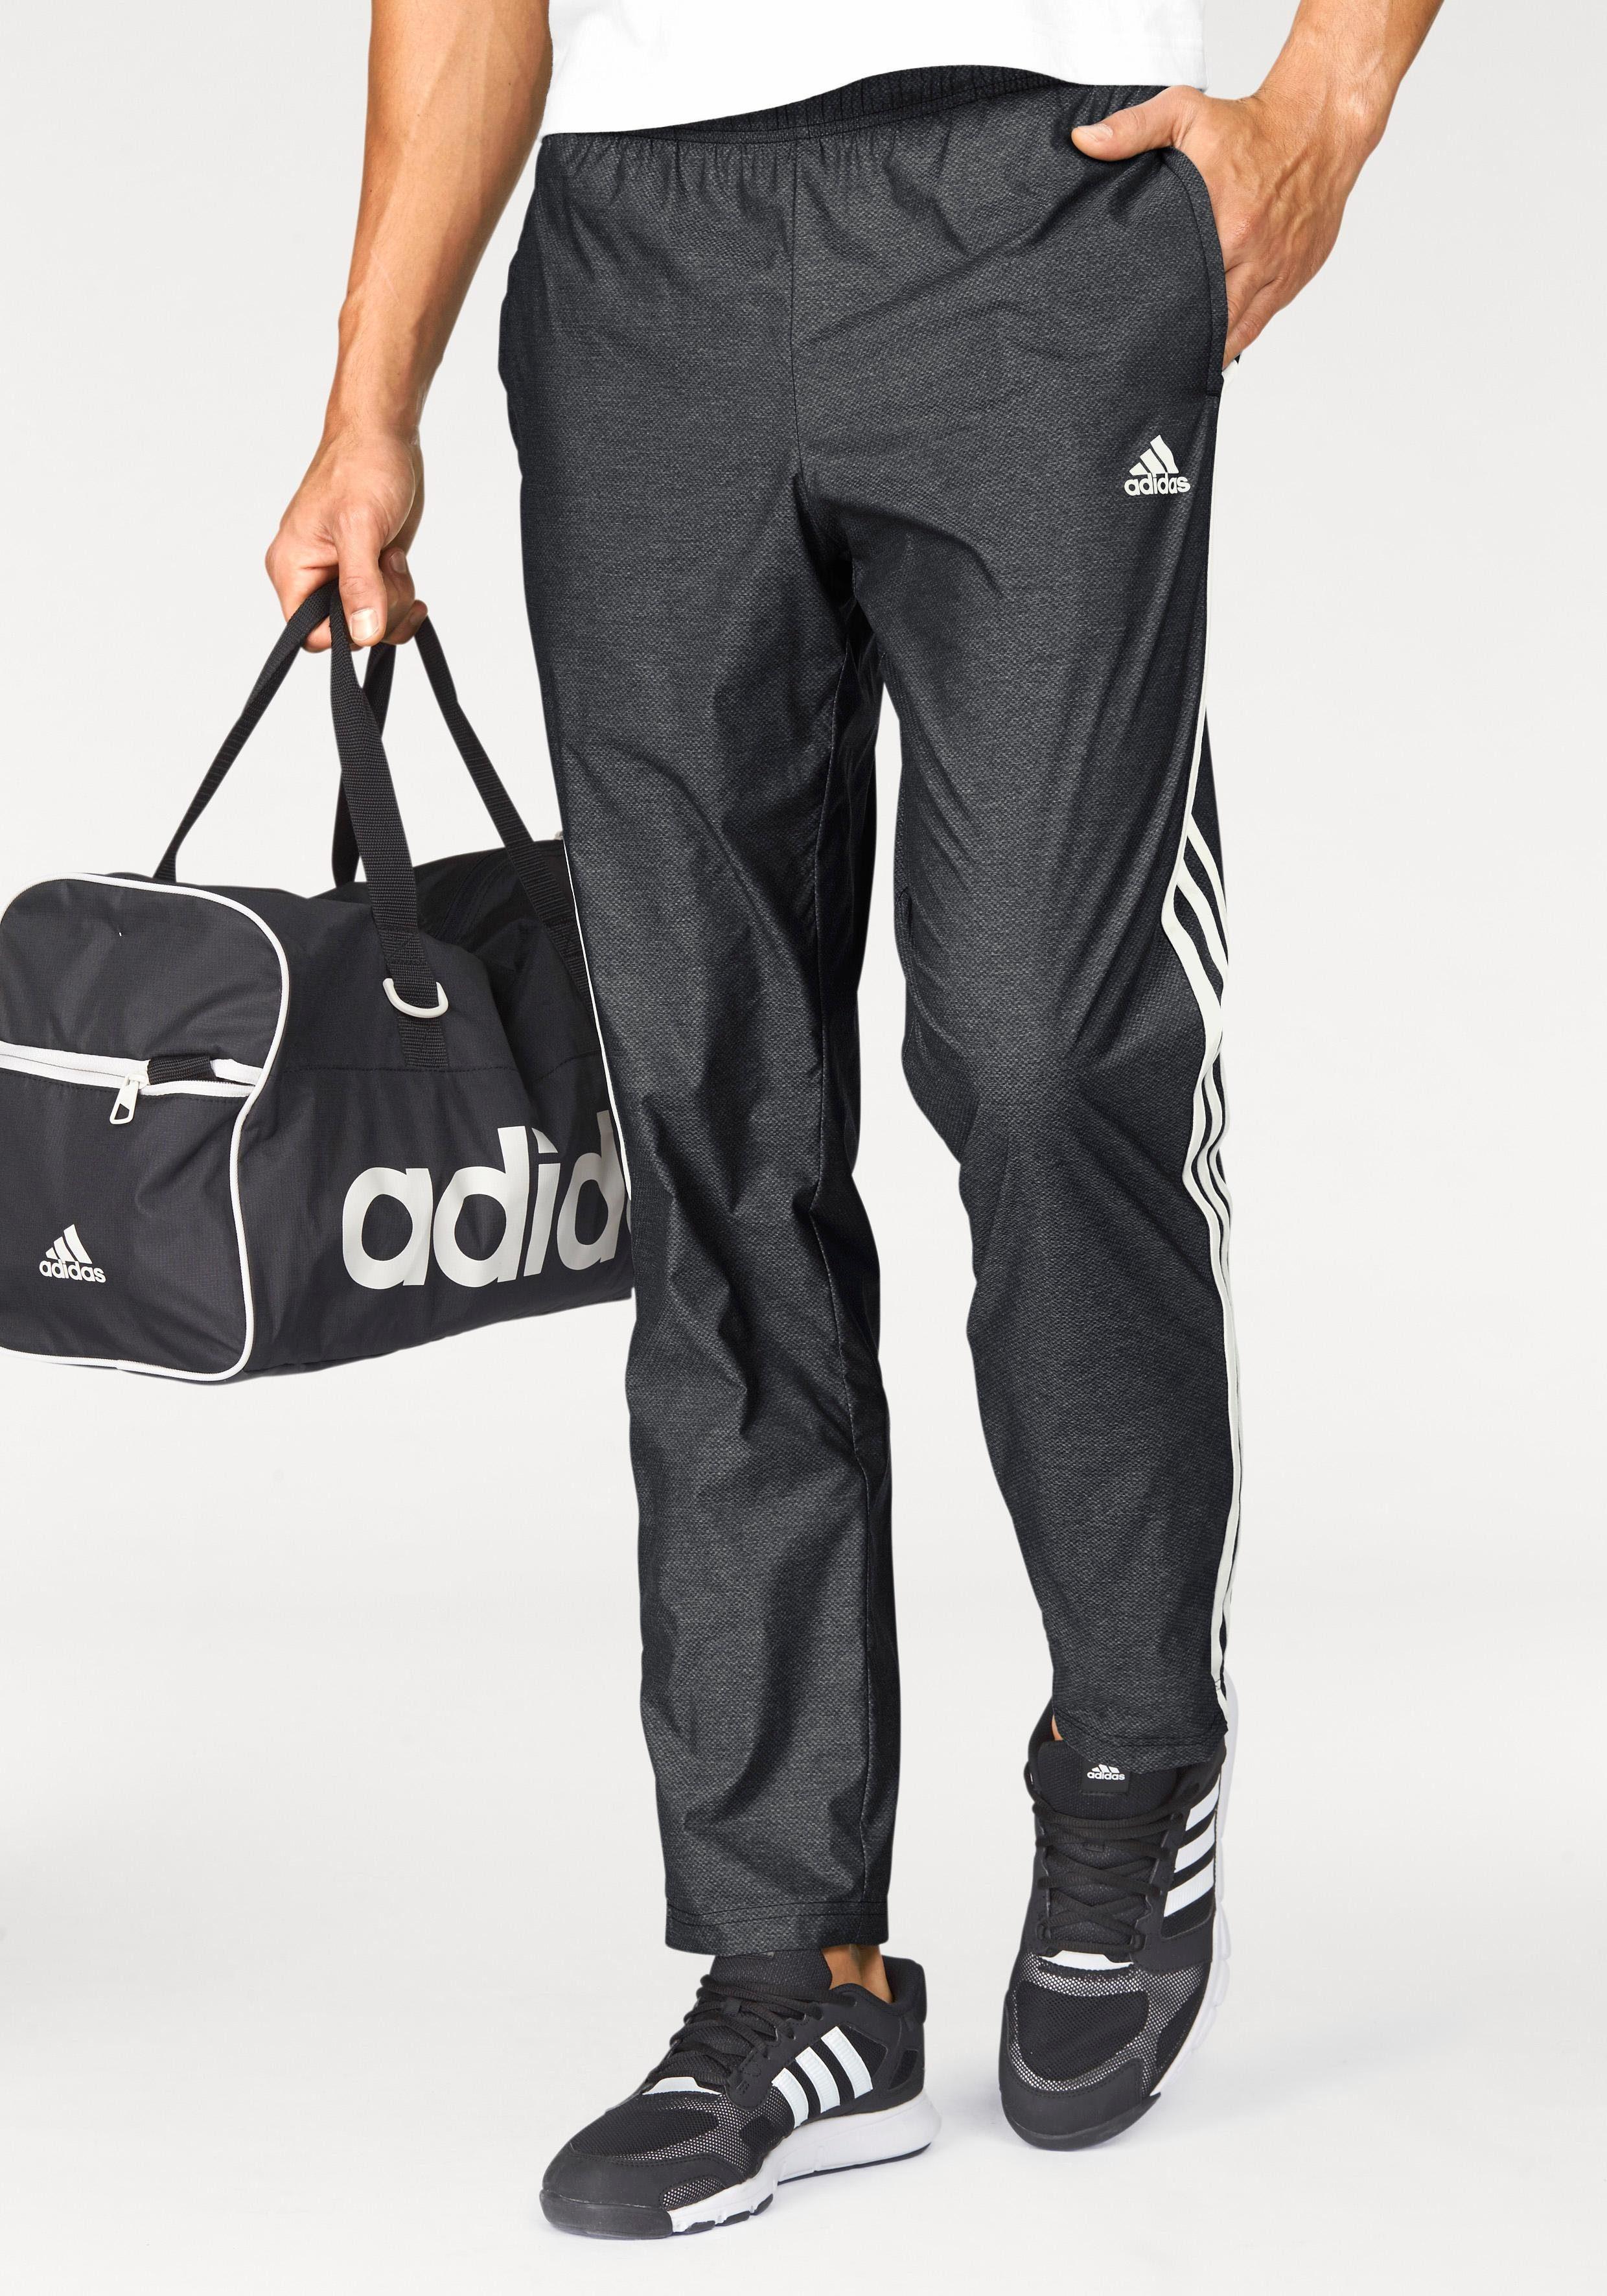 Adidas Herrenhosen Herrenhosen Kaufen Online Adidas Otto YZYqExd1rw